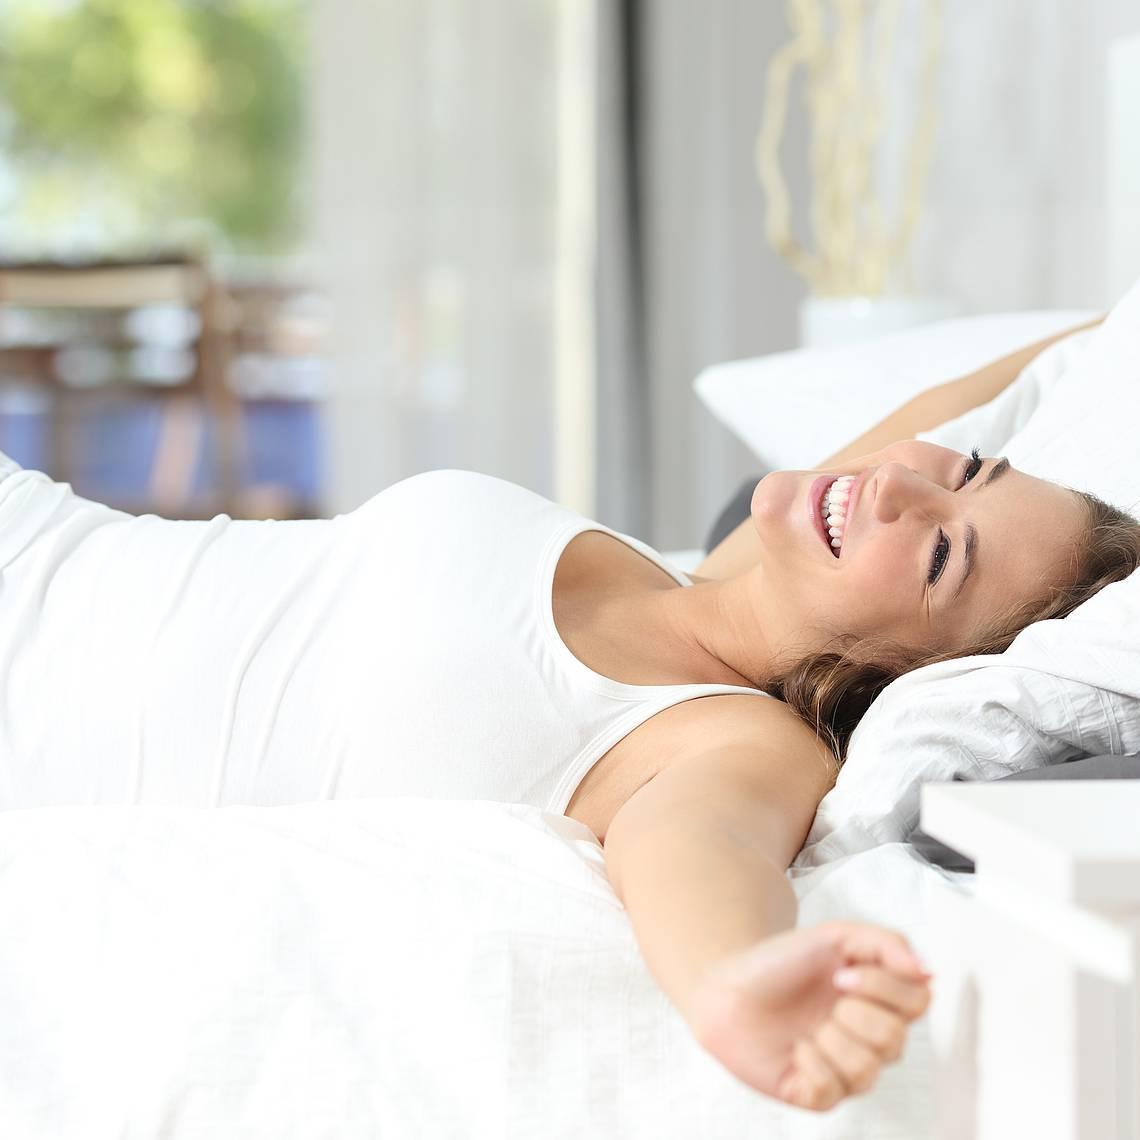 Frau wird wach im Bett